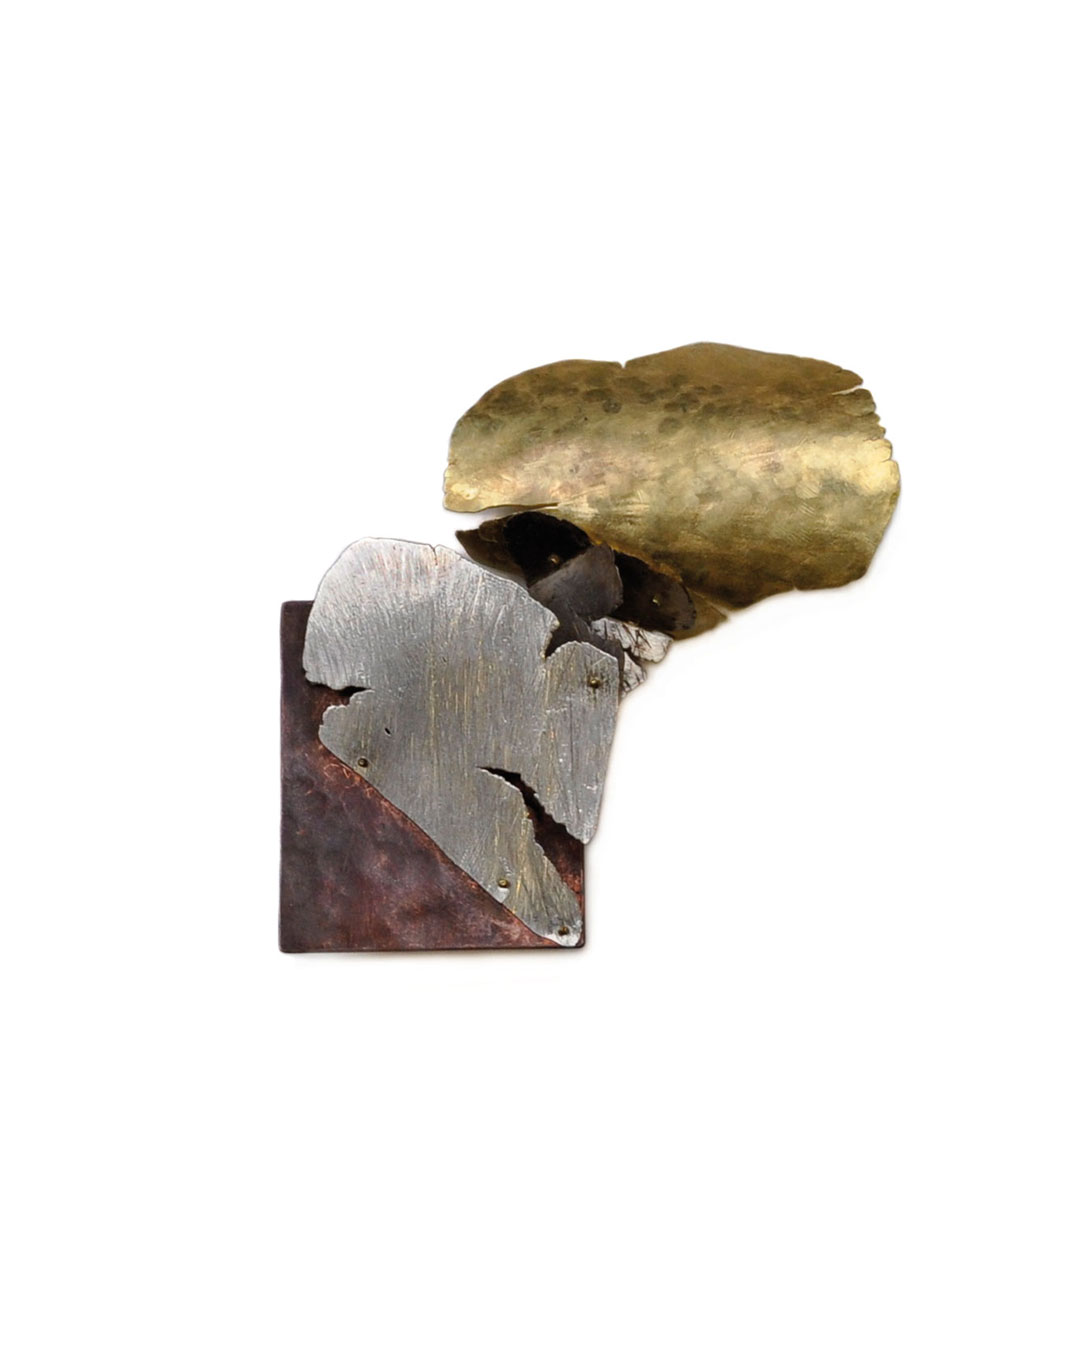 Stefano Marchetti, untitled, 2010, brooch; gold, copper, 78 x 77 x 16 mm, €5400